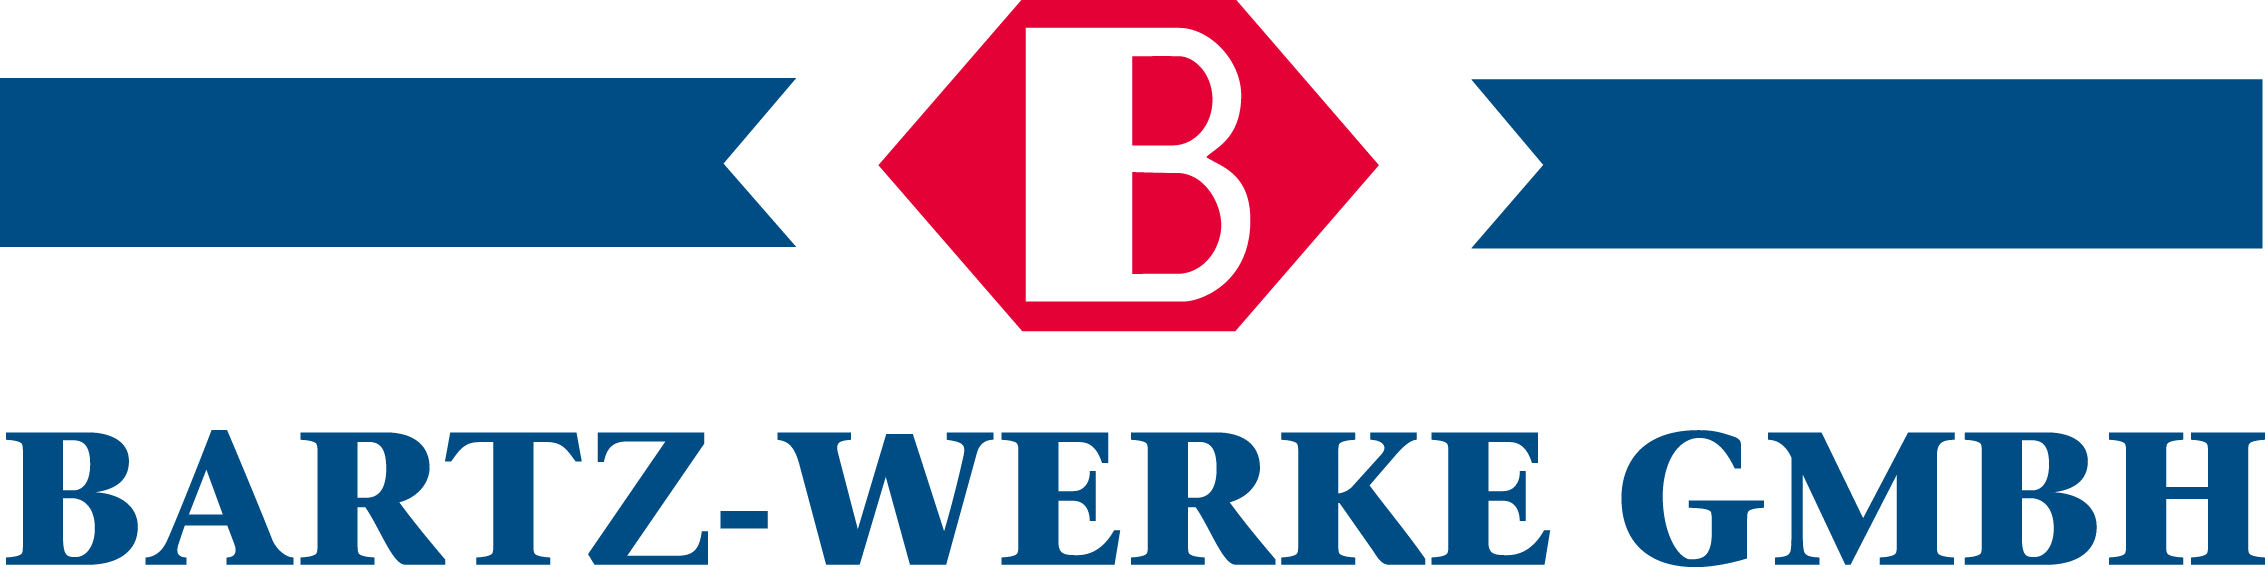 Picto Bartz-Werke GmbH